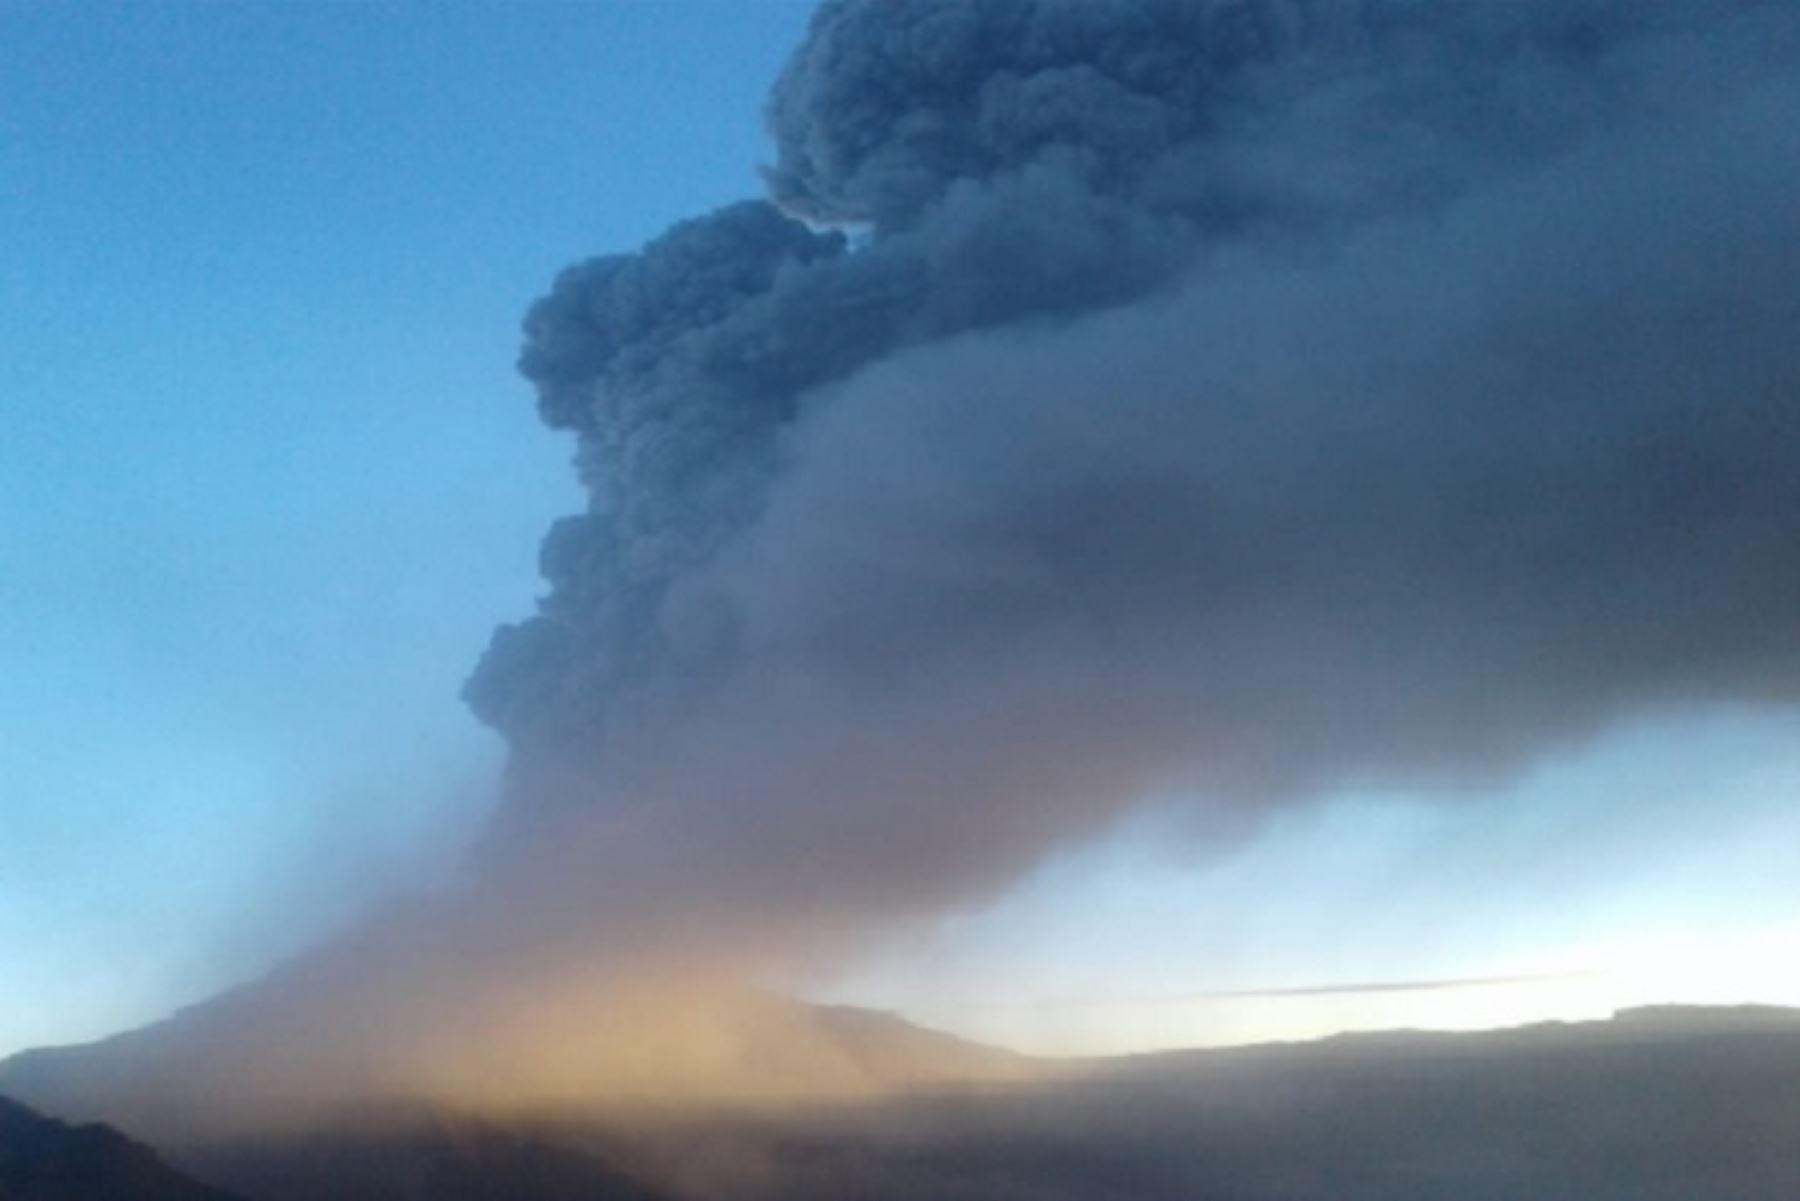 Gobierno Regional Moquegua eleva de amarilla a naranja alerta del volcán Ubinas